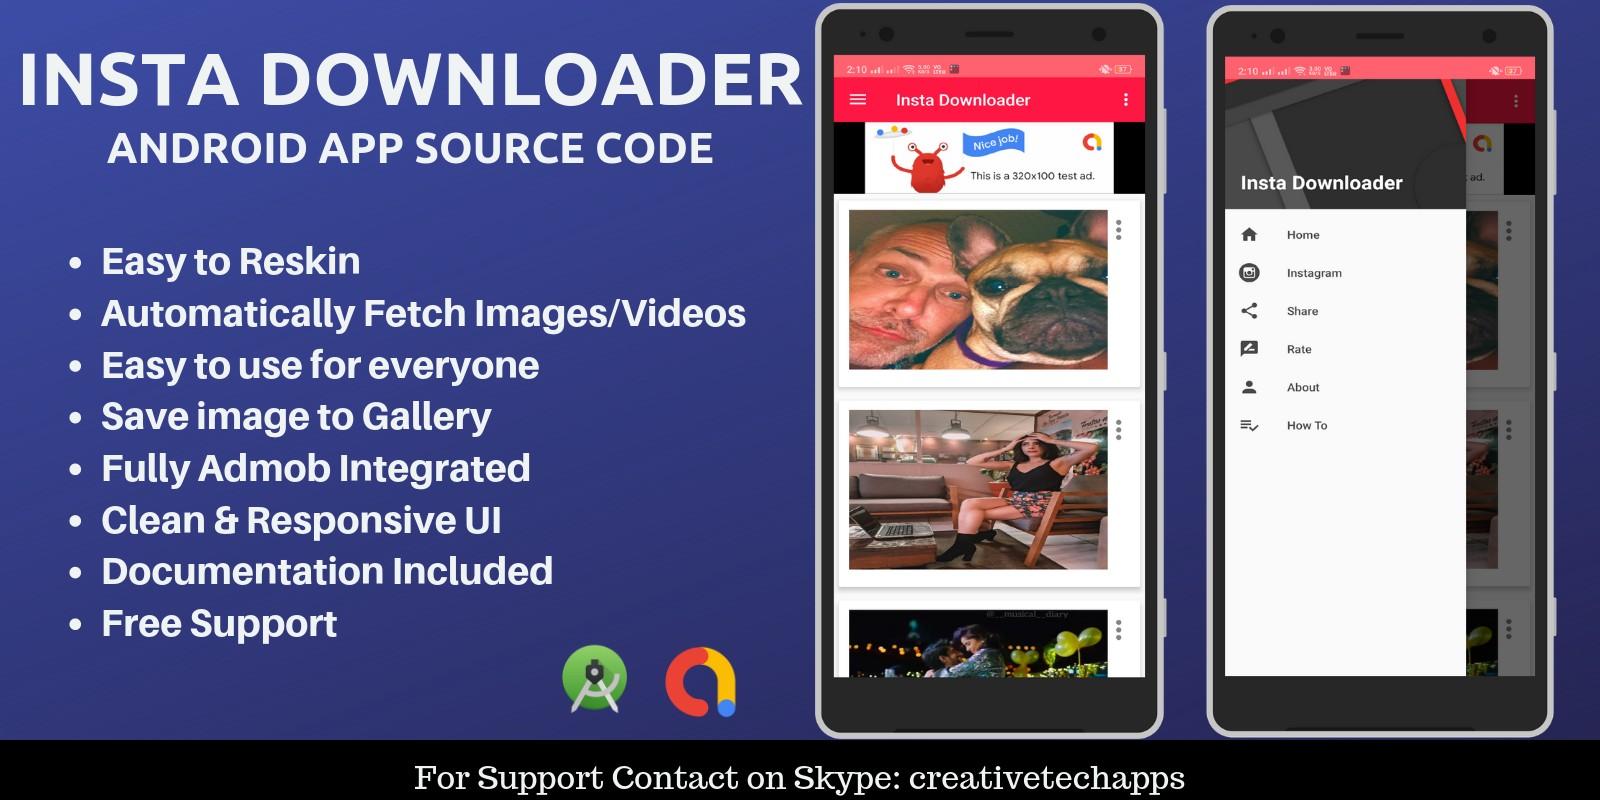 Insta Downloader - Android App Source Code